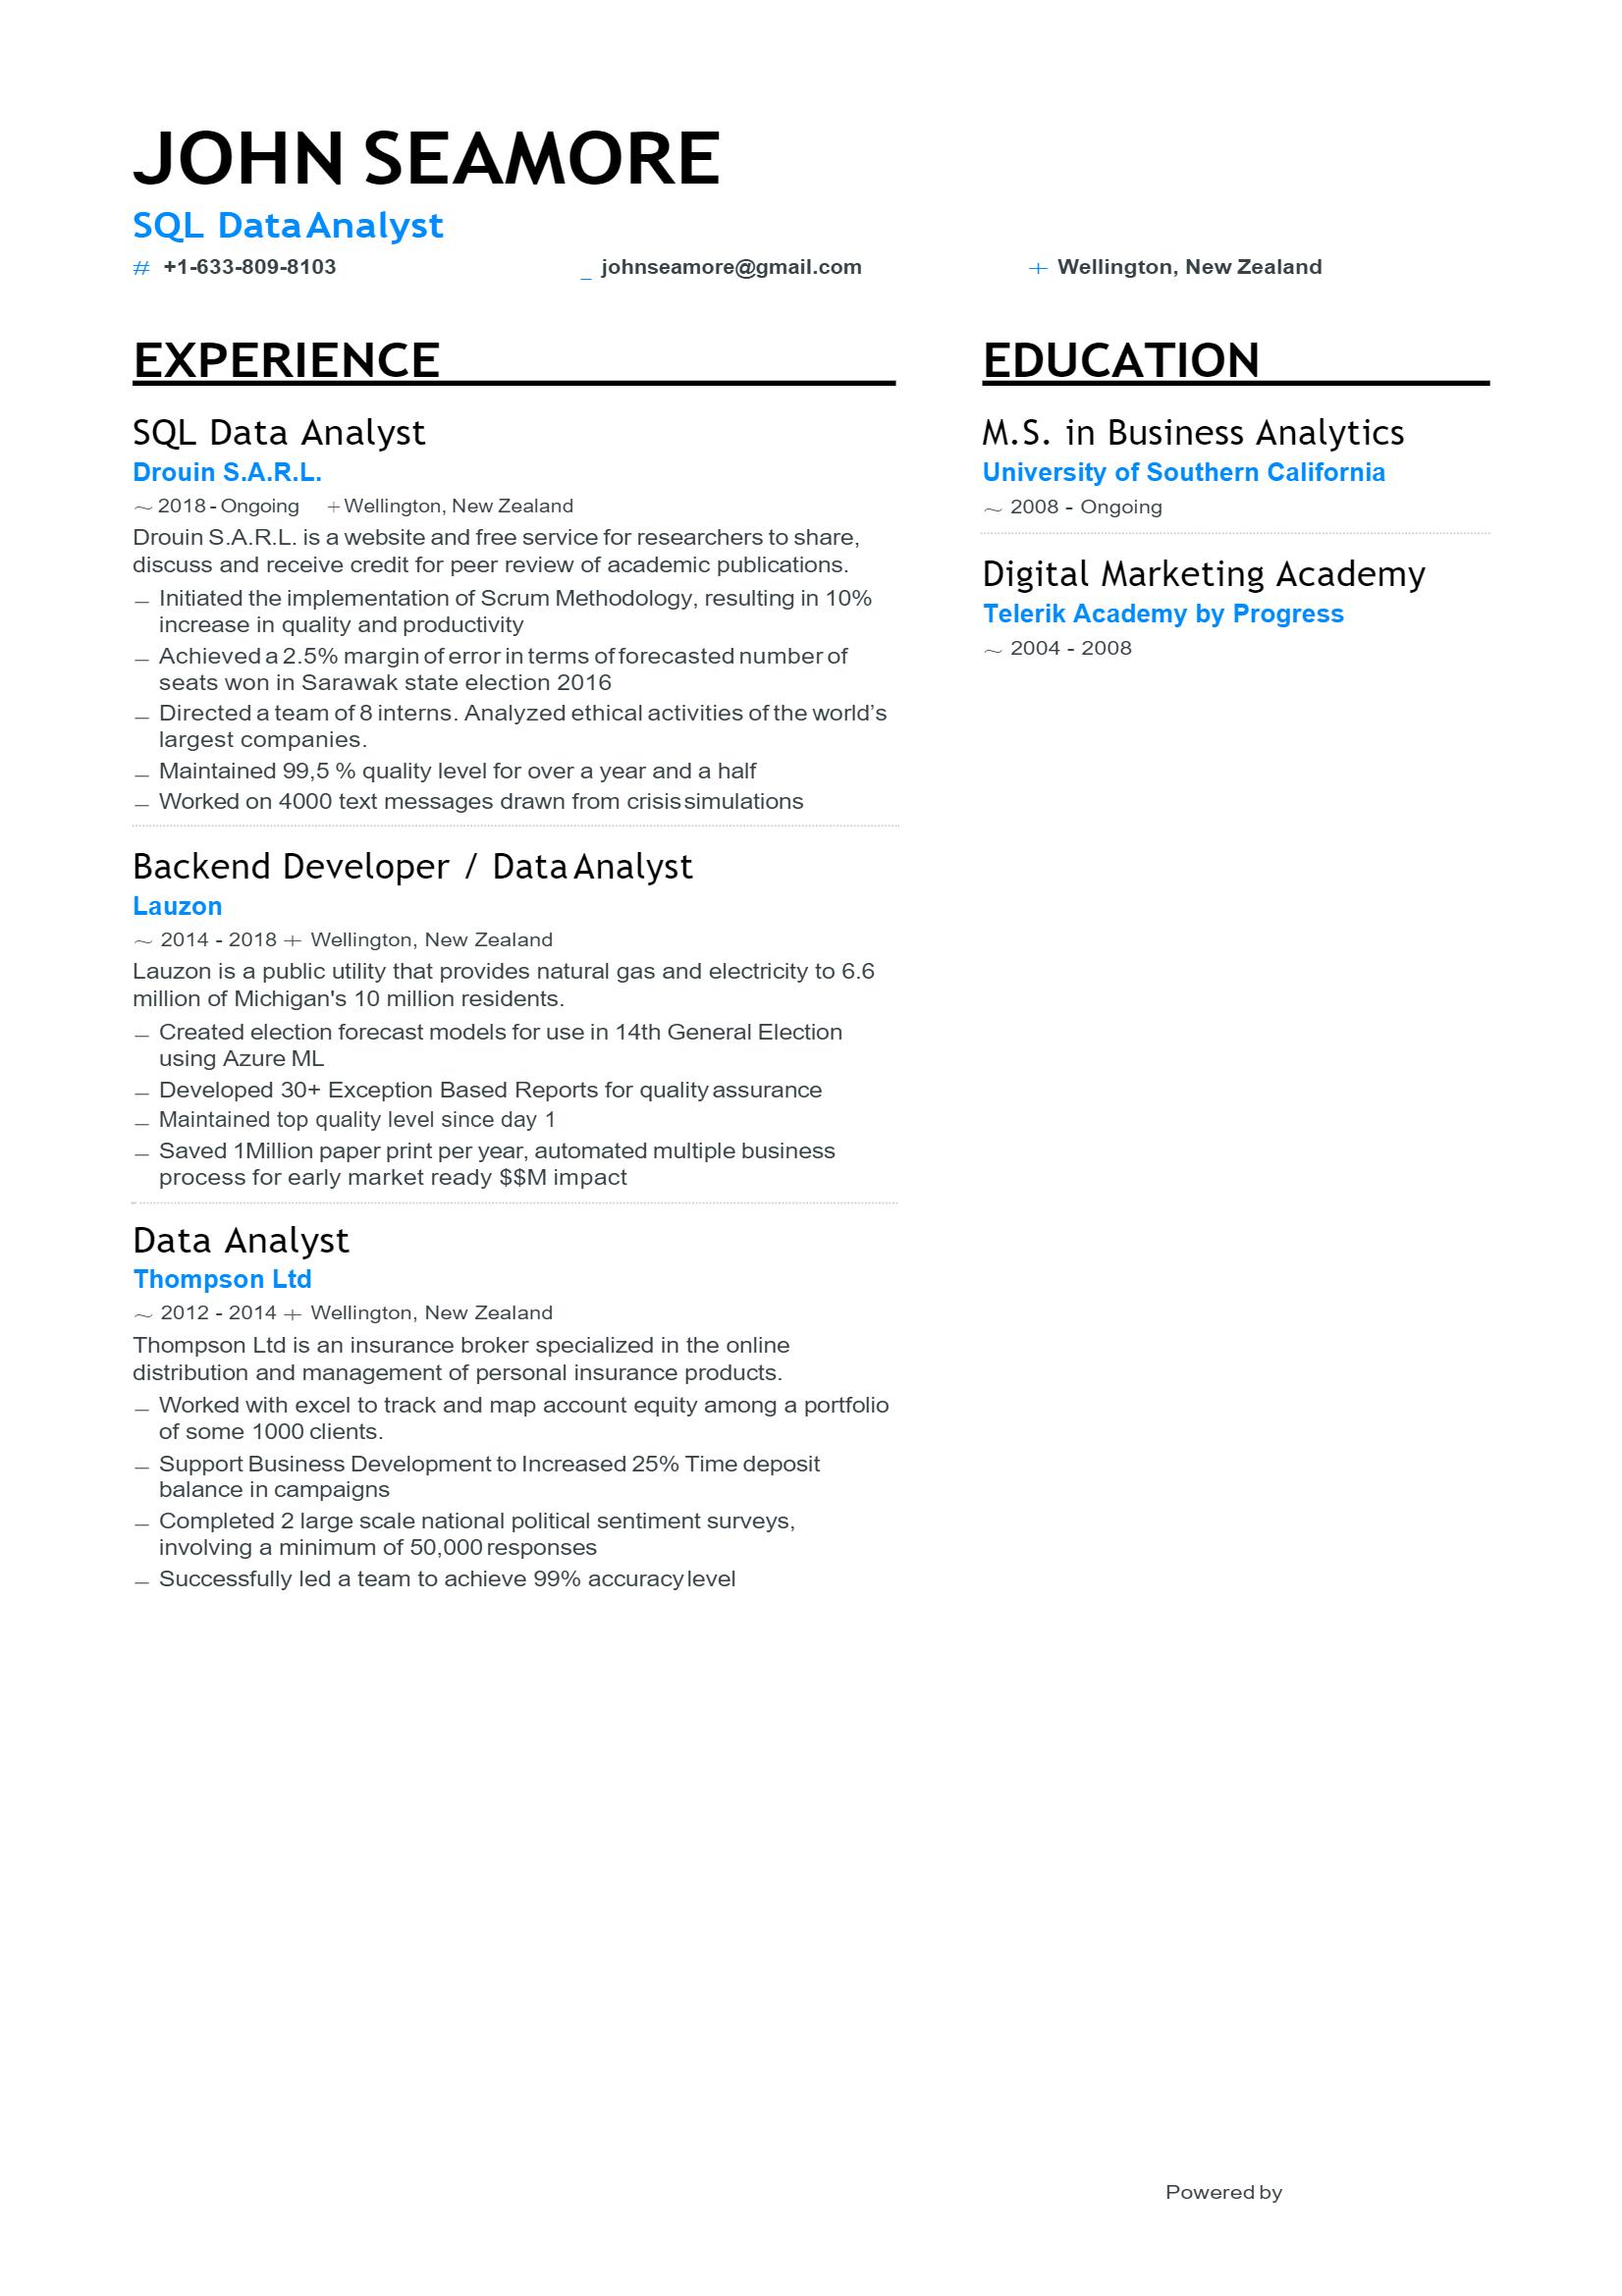 SQL Data Analyst .Docx (Word)